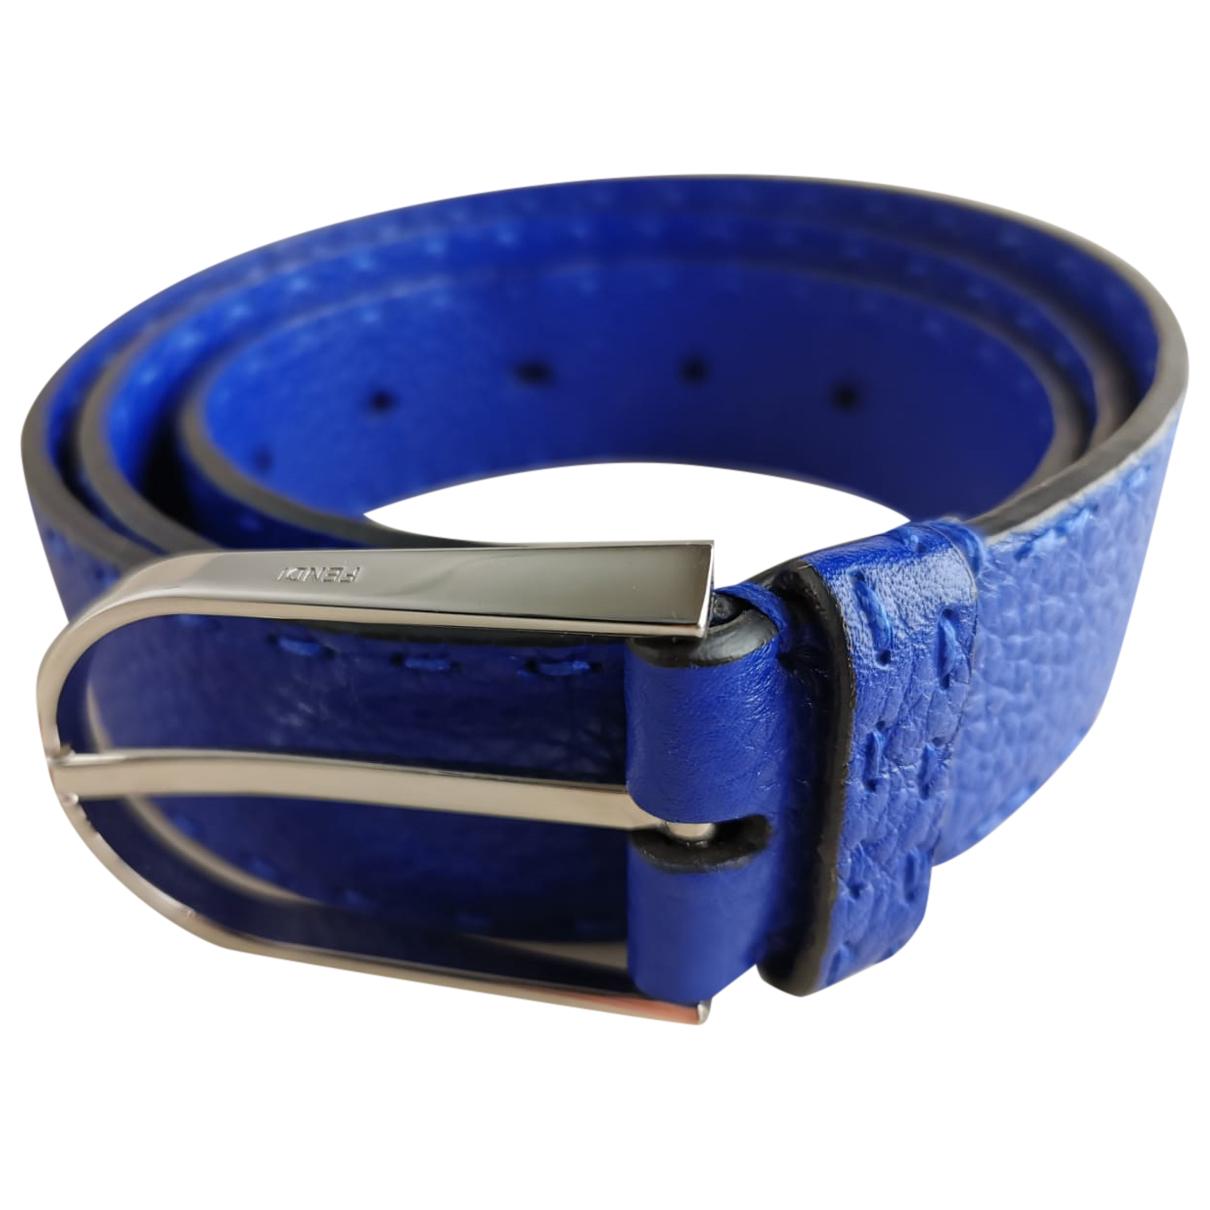 Fendi \N Blue Leather belt for Men 95 cm